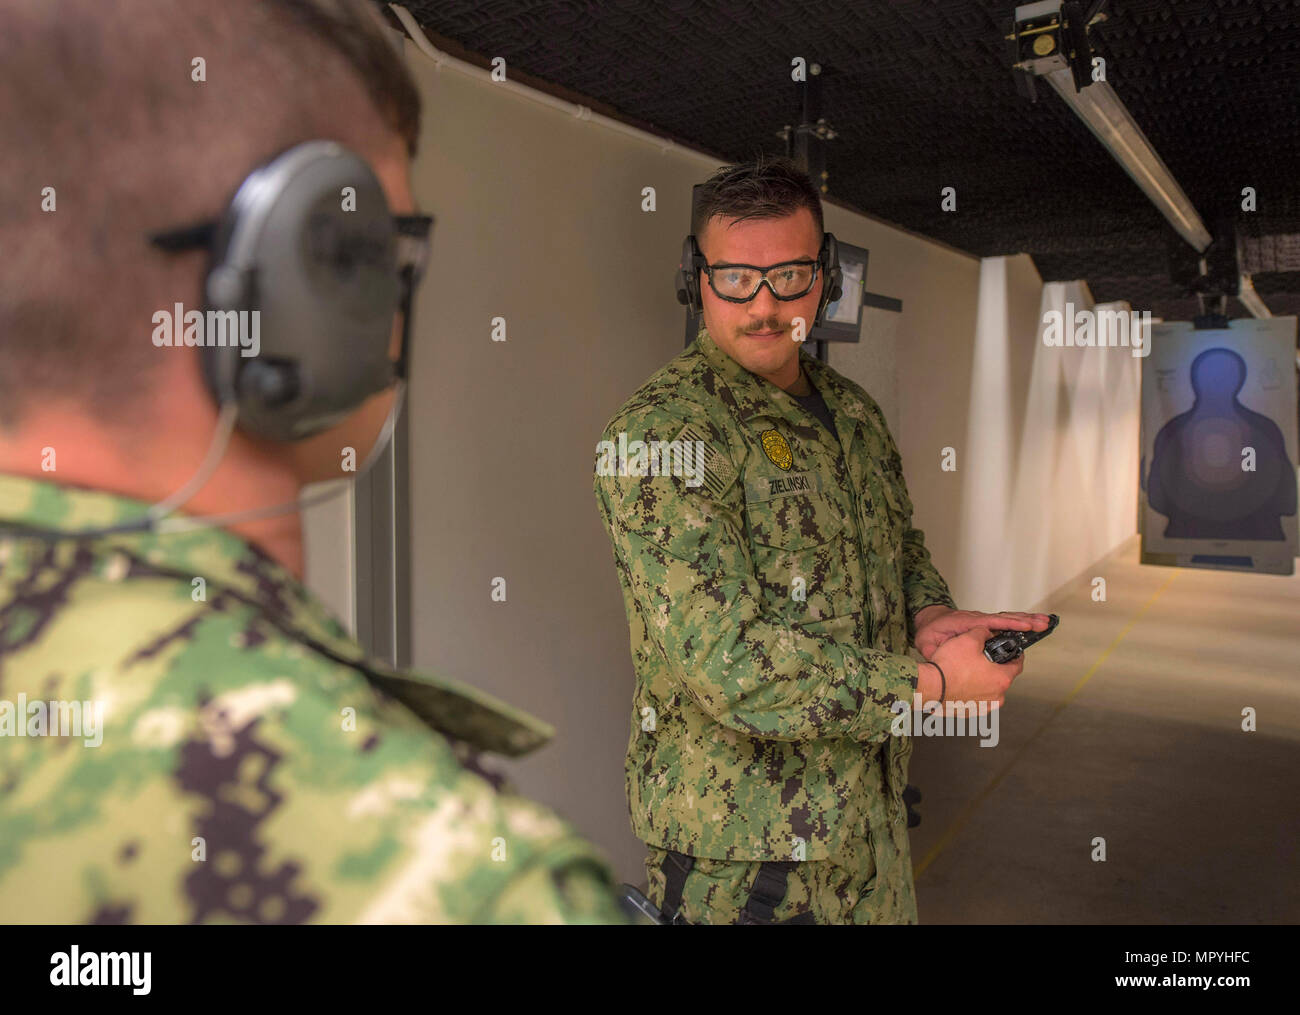 Navy Munitions Command Stock Photos Amp Navy Munitions Command Stock Images